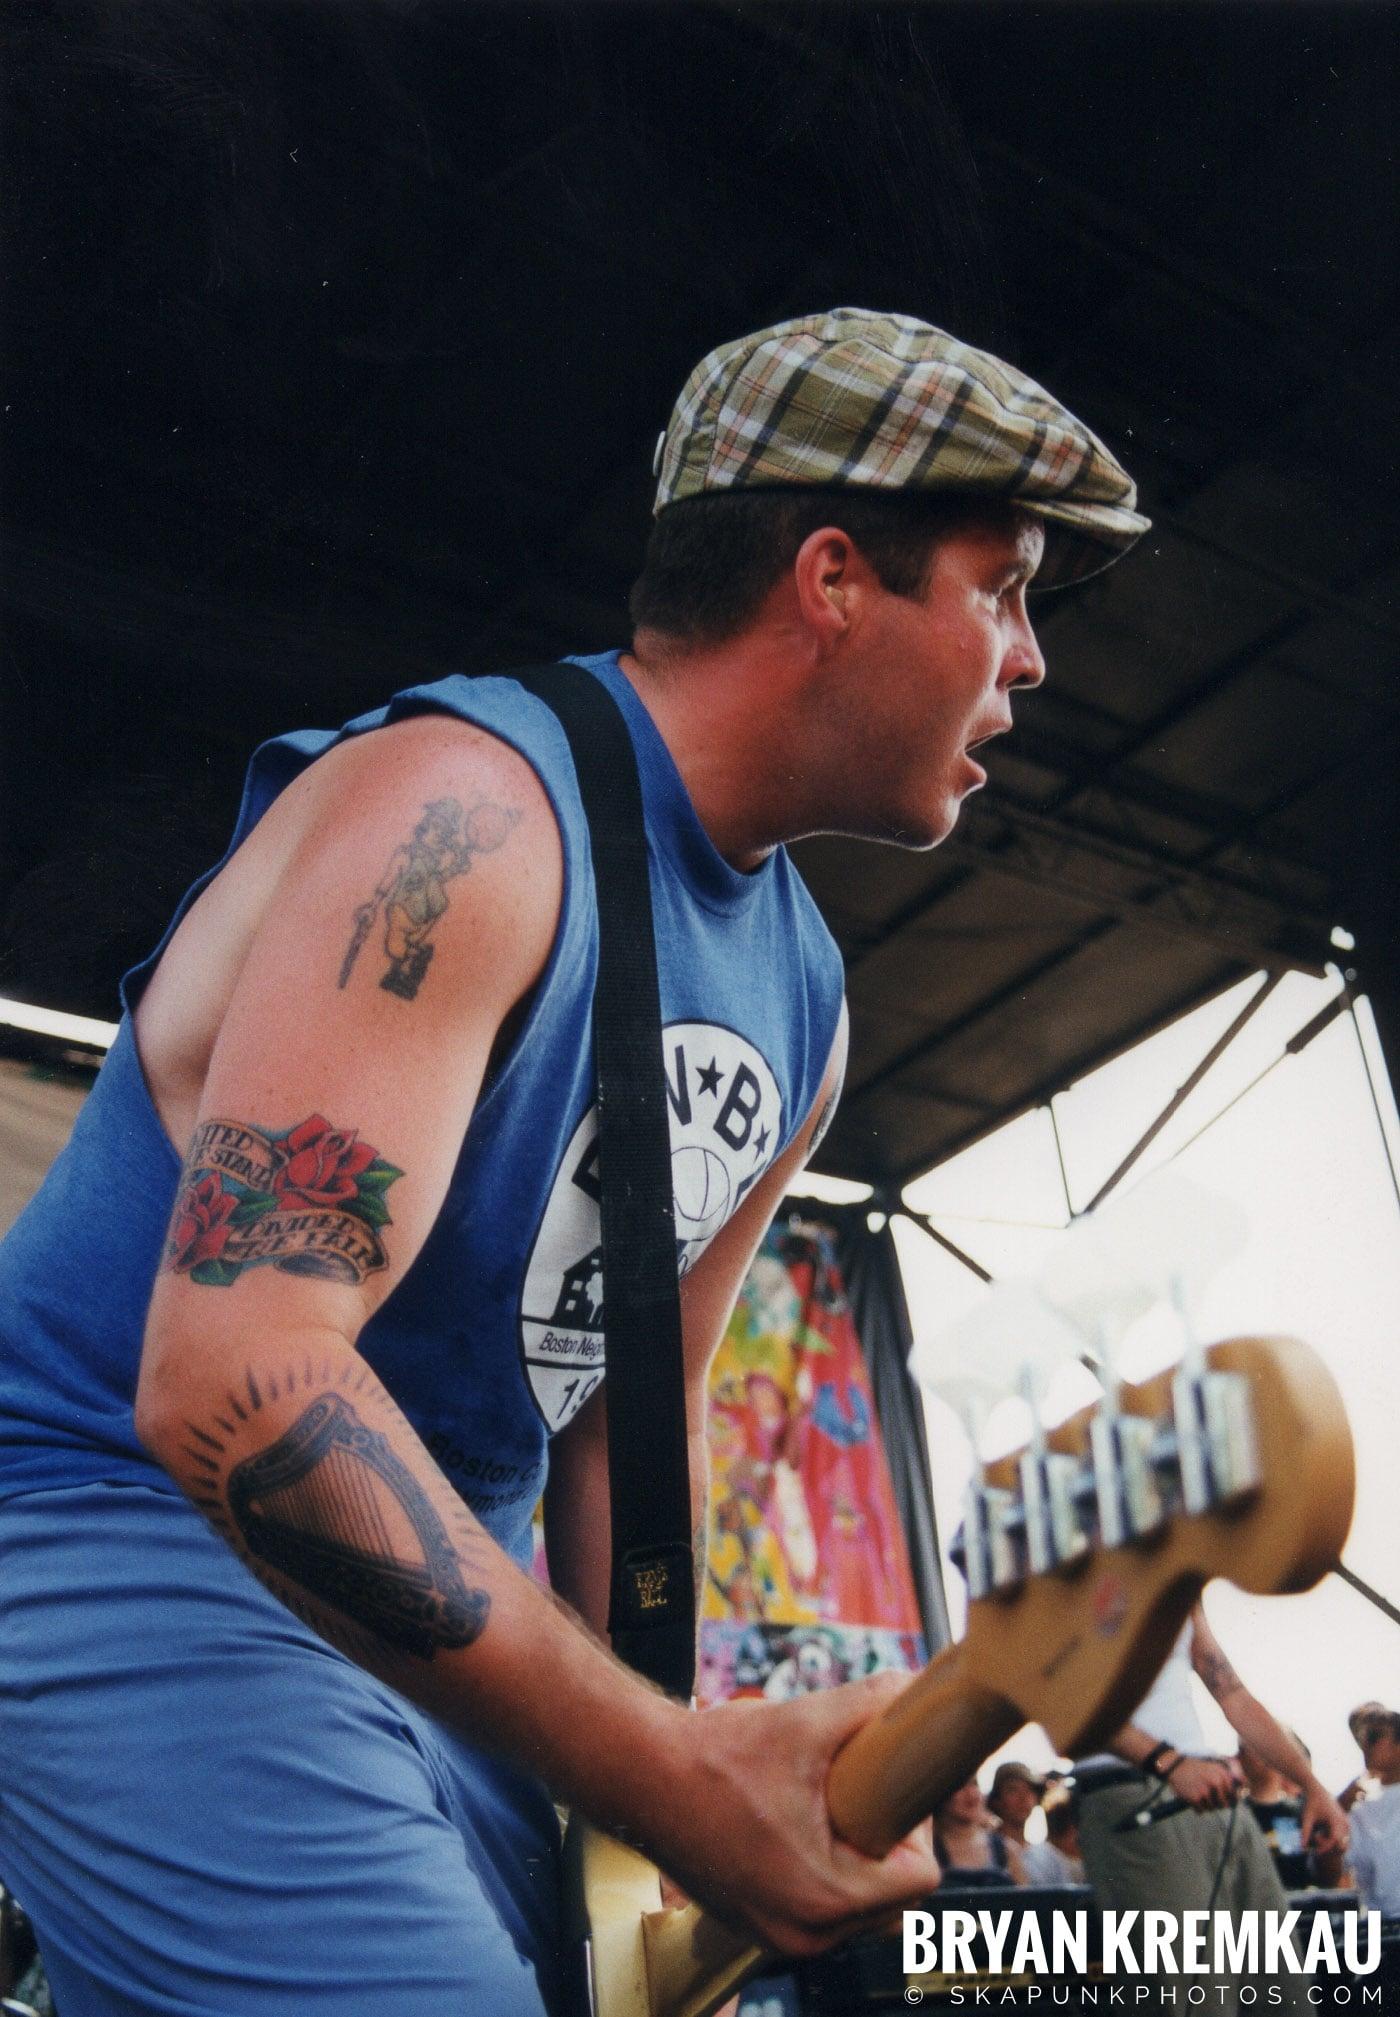 The Dropkick Murphys @ Vans Warped Tour, Randall's Island, NYC - 7.16.99 (2)